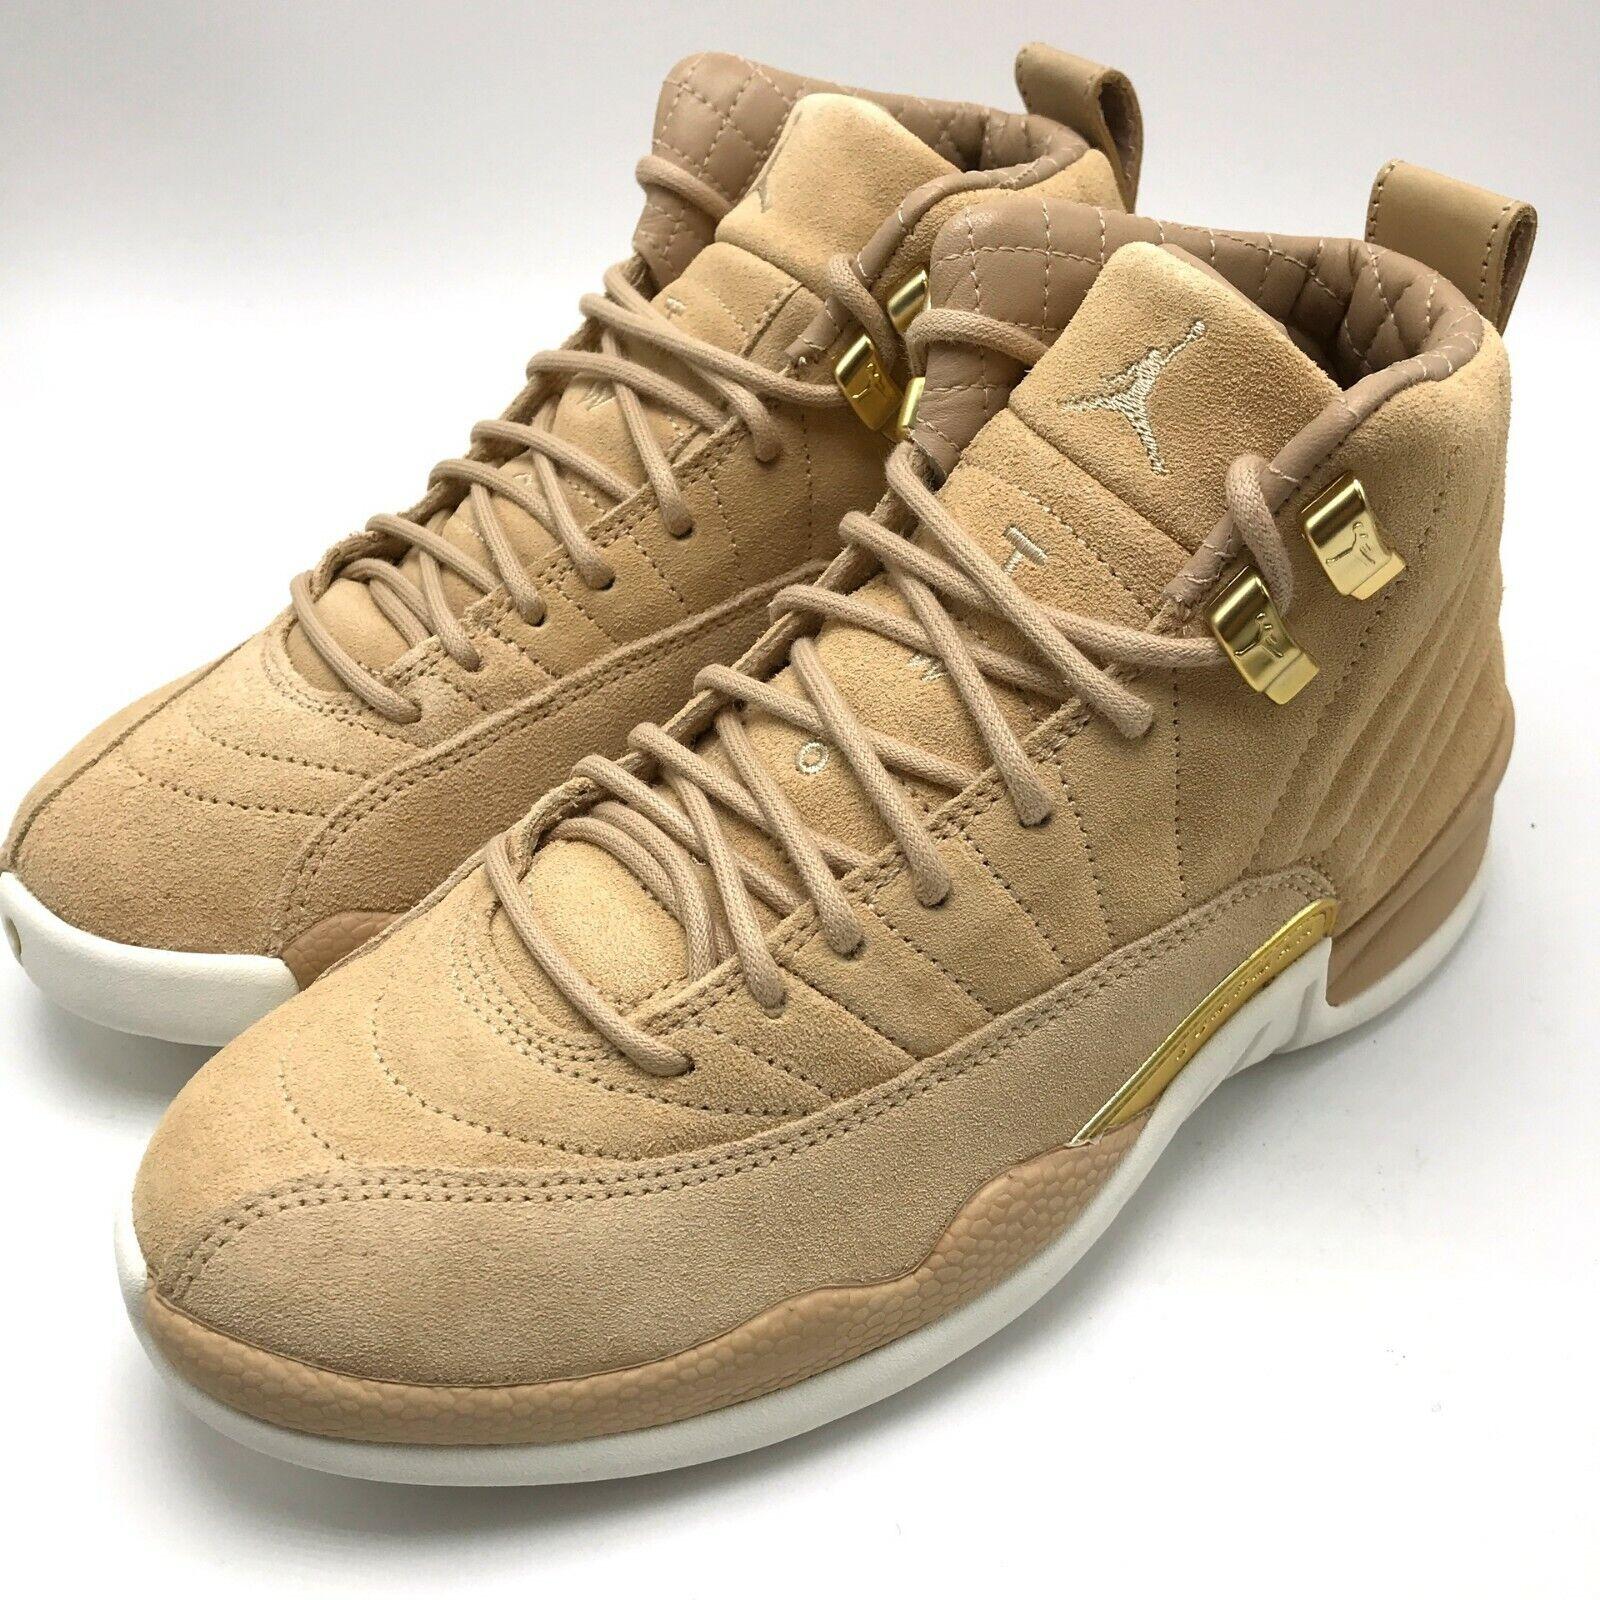 huge selection of ab99b 36a9c Air Jordan Retro 12 Nike Vachetta Tan Shoes Size 7.5 M Women's SNEAKERS  Ao6068